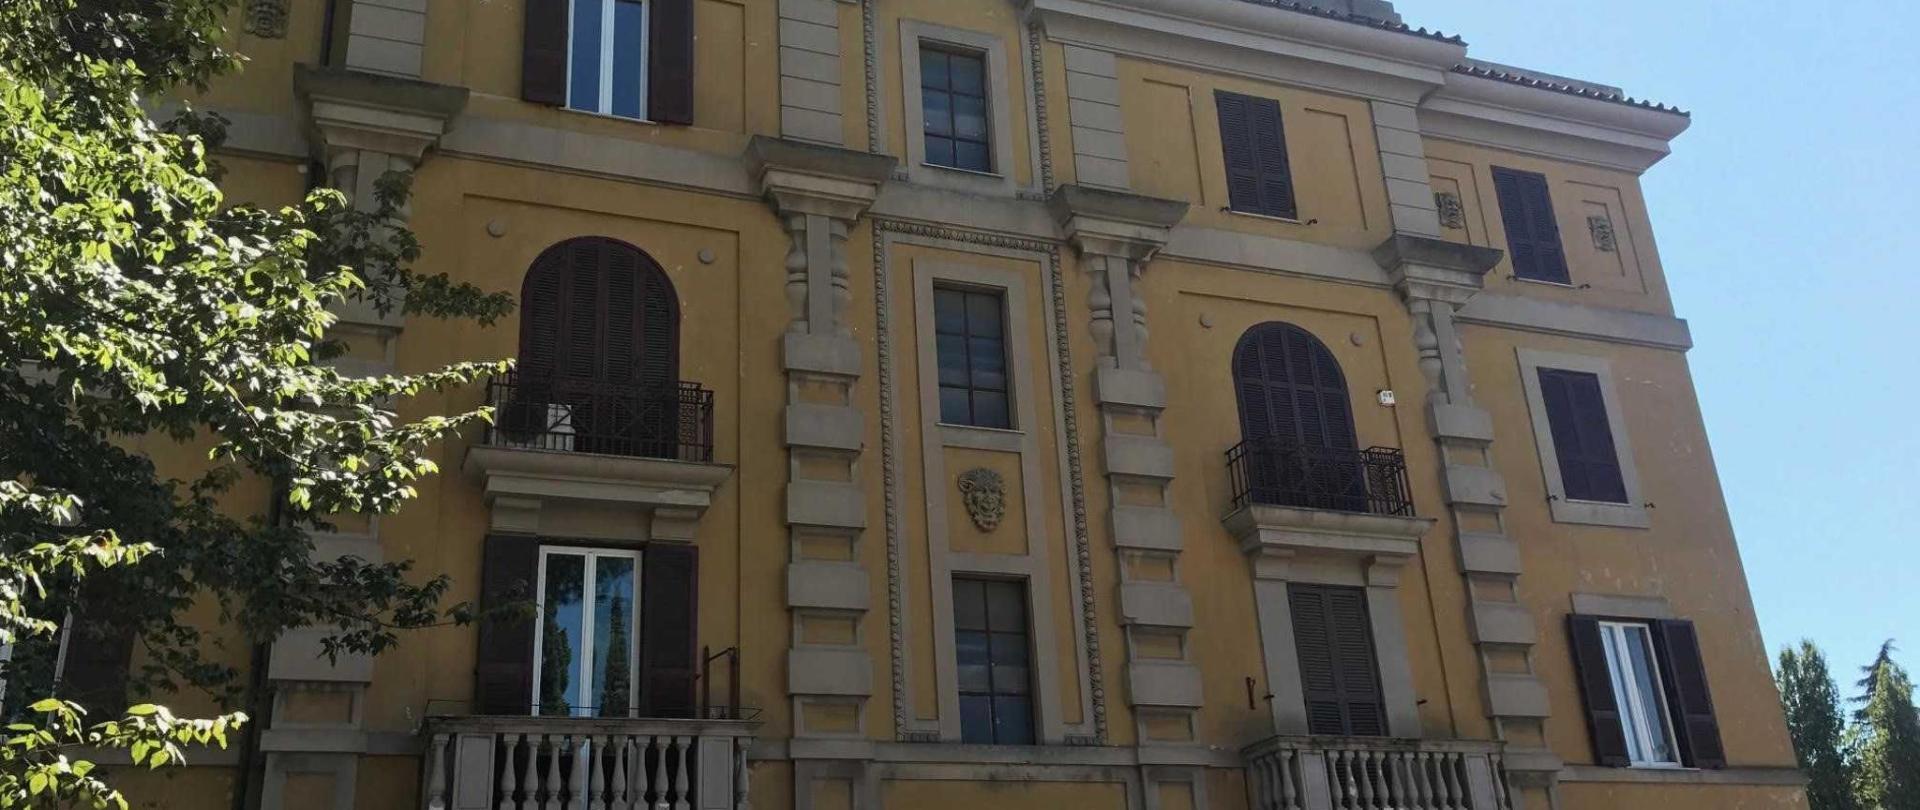 palazzo-booking.jpg